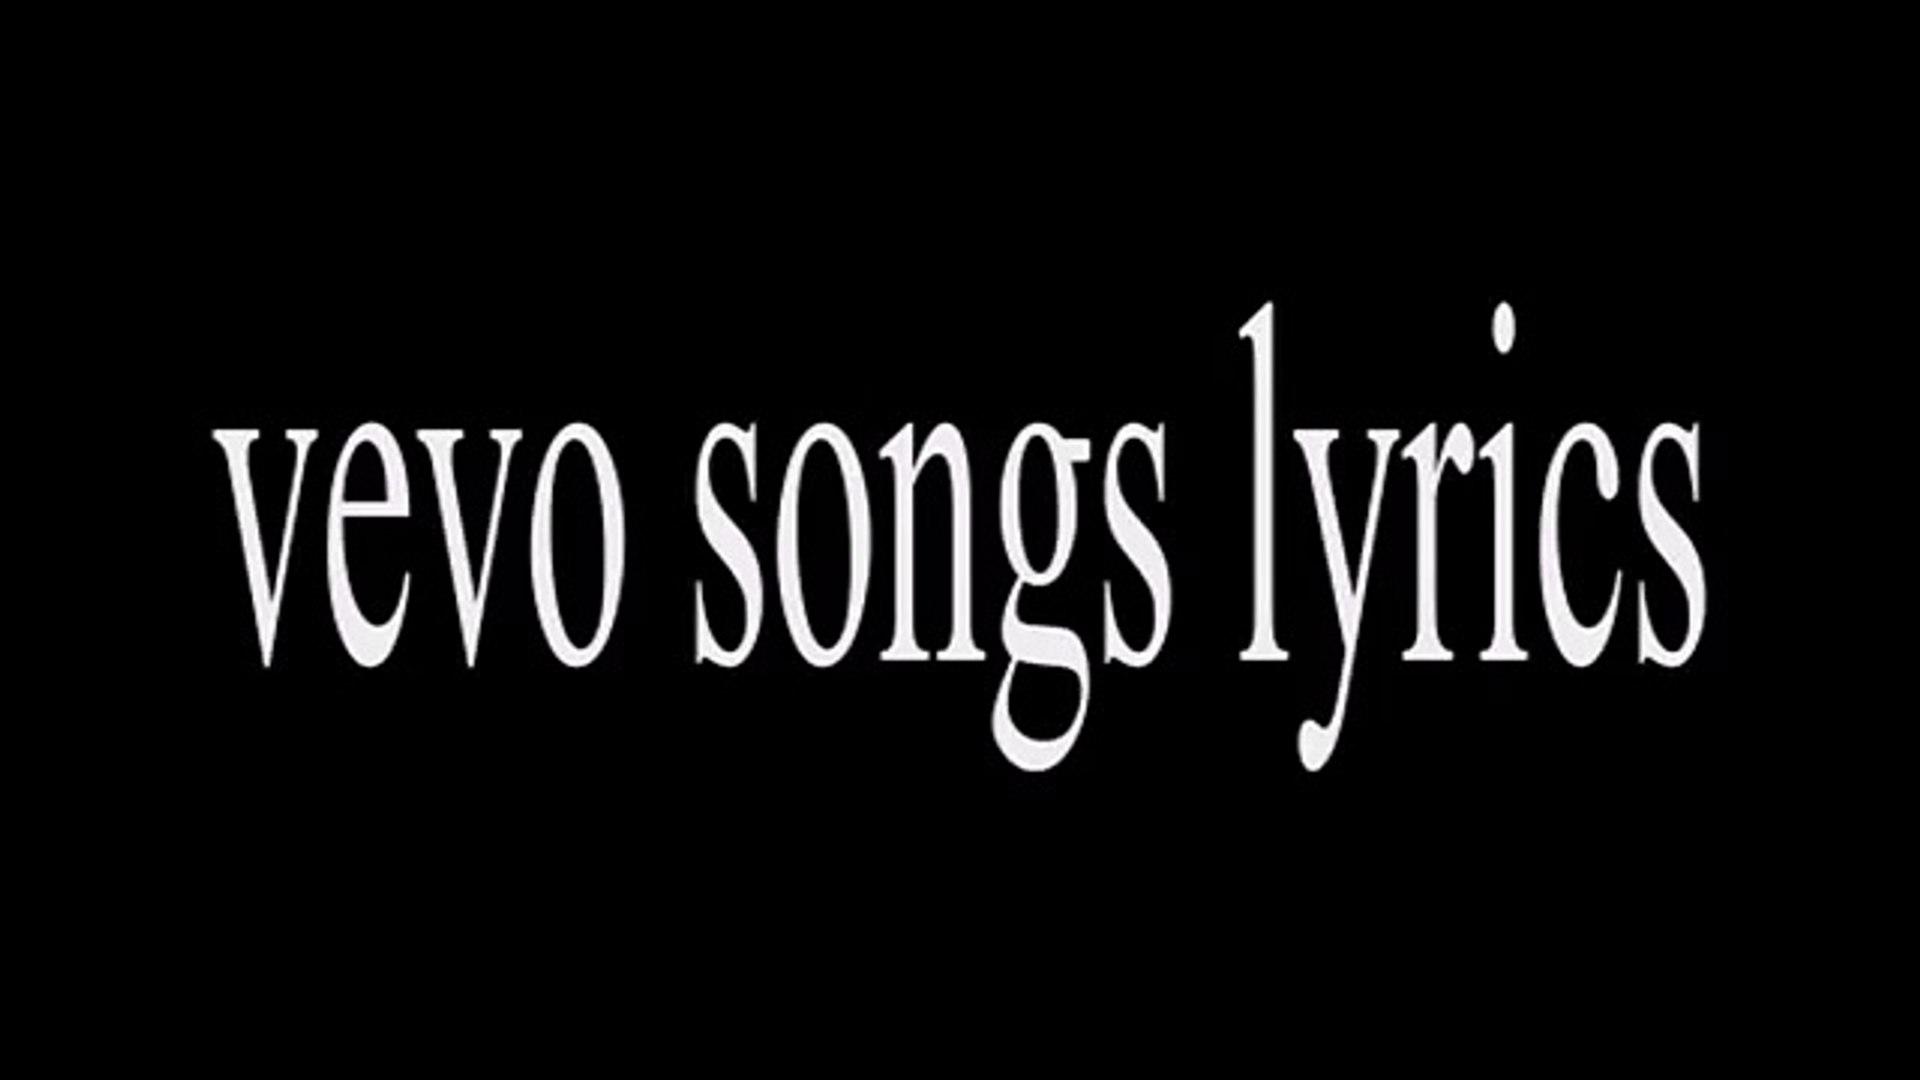 vevo songs lyrics (FULL HD)